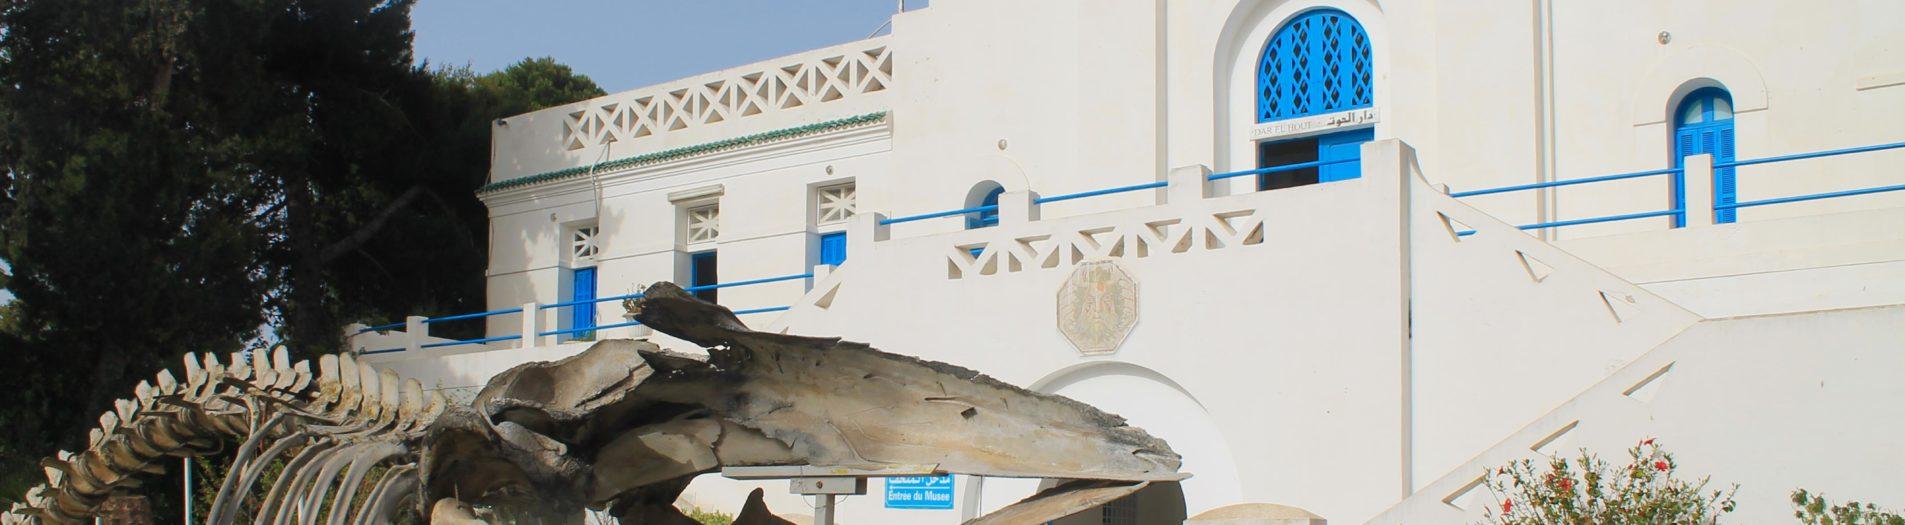 Musée océanographique de Salammbo